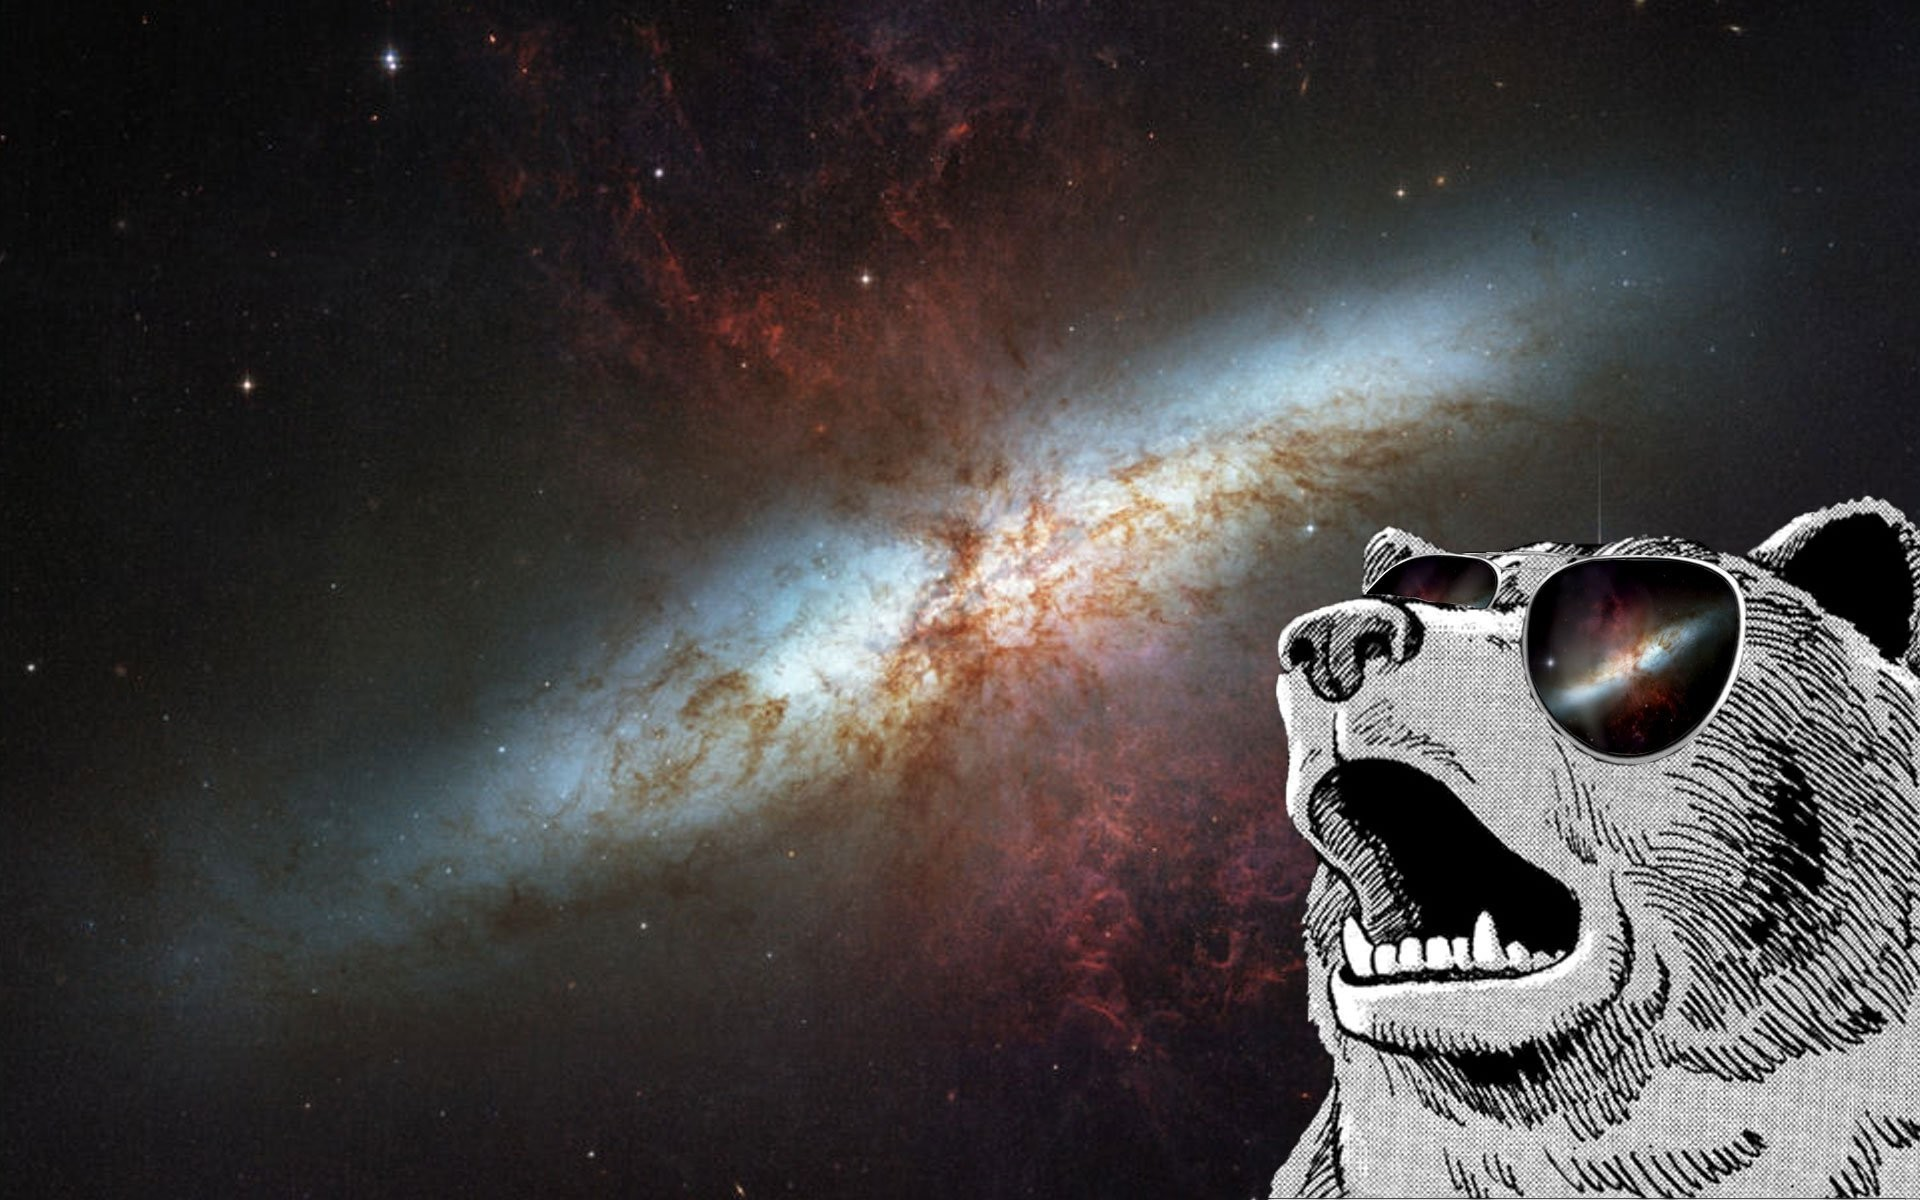 dank meme wallpaper desktop – photo #11